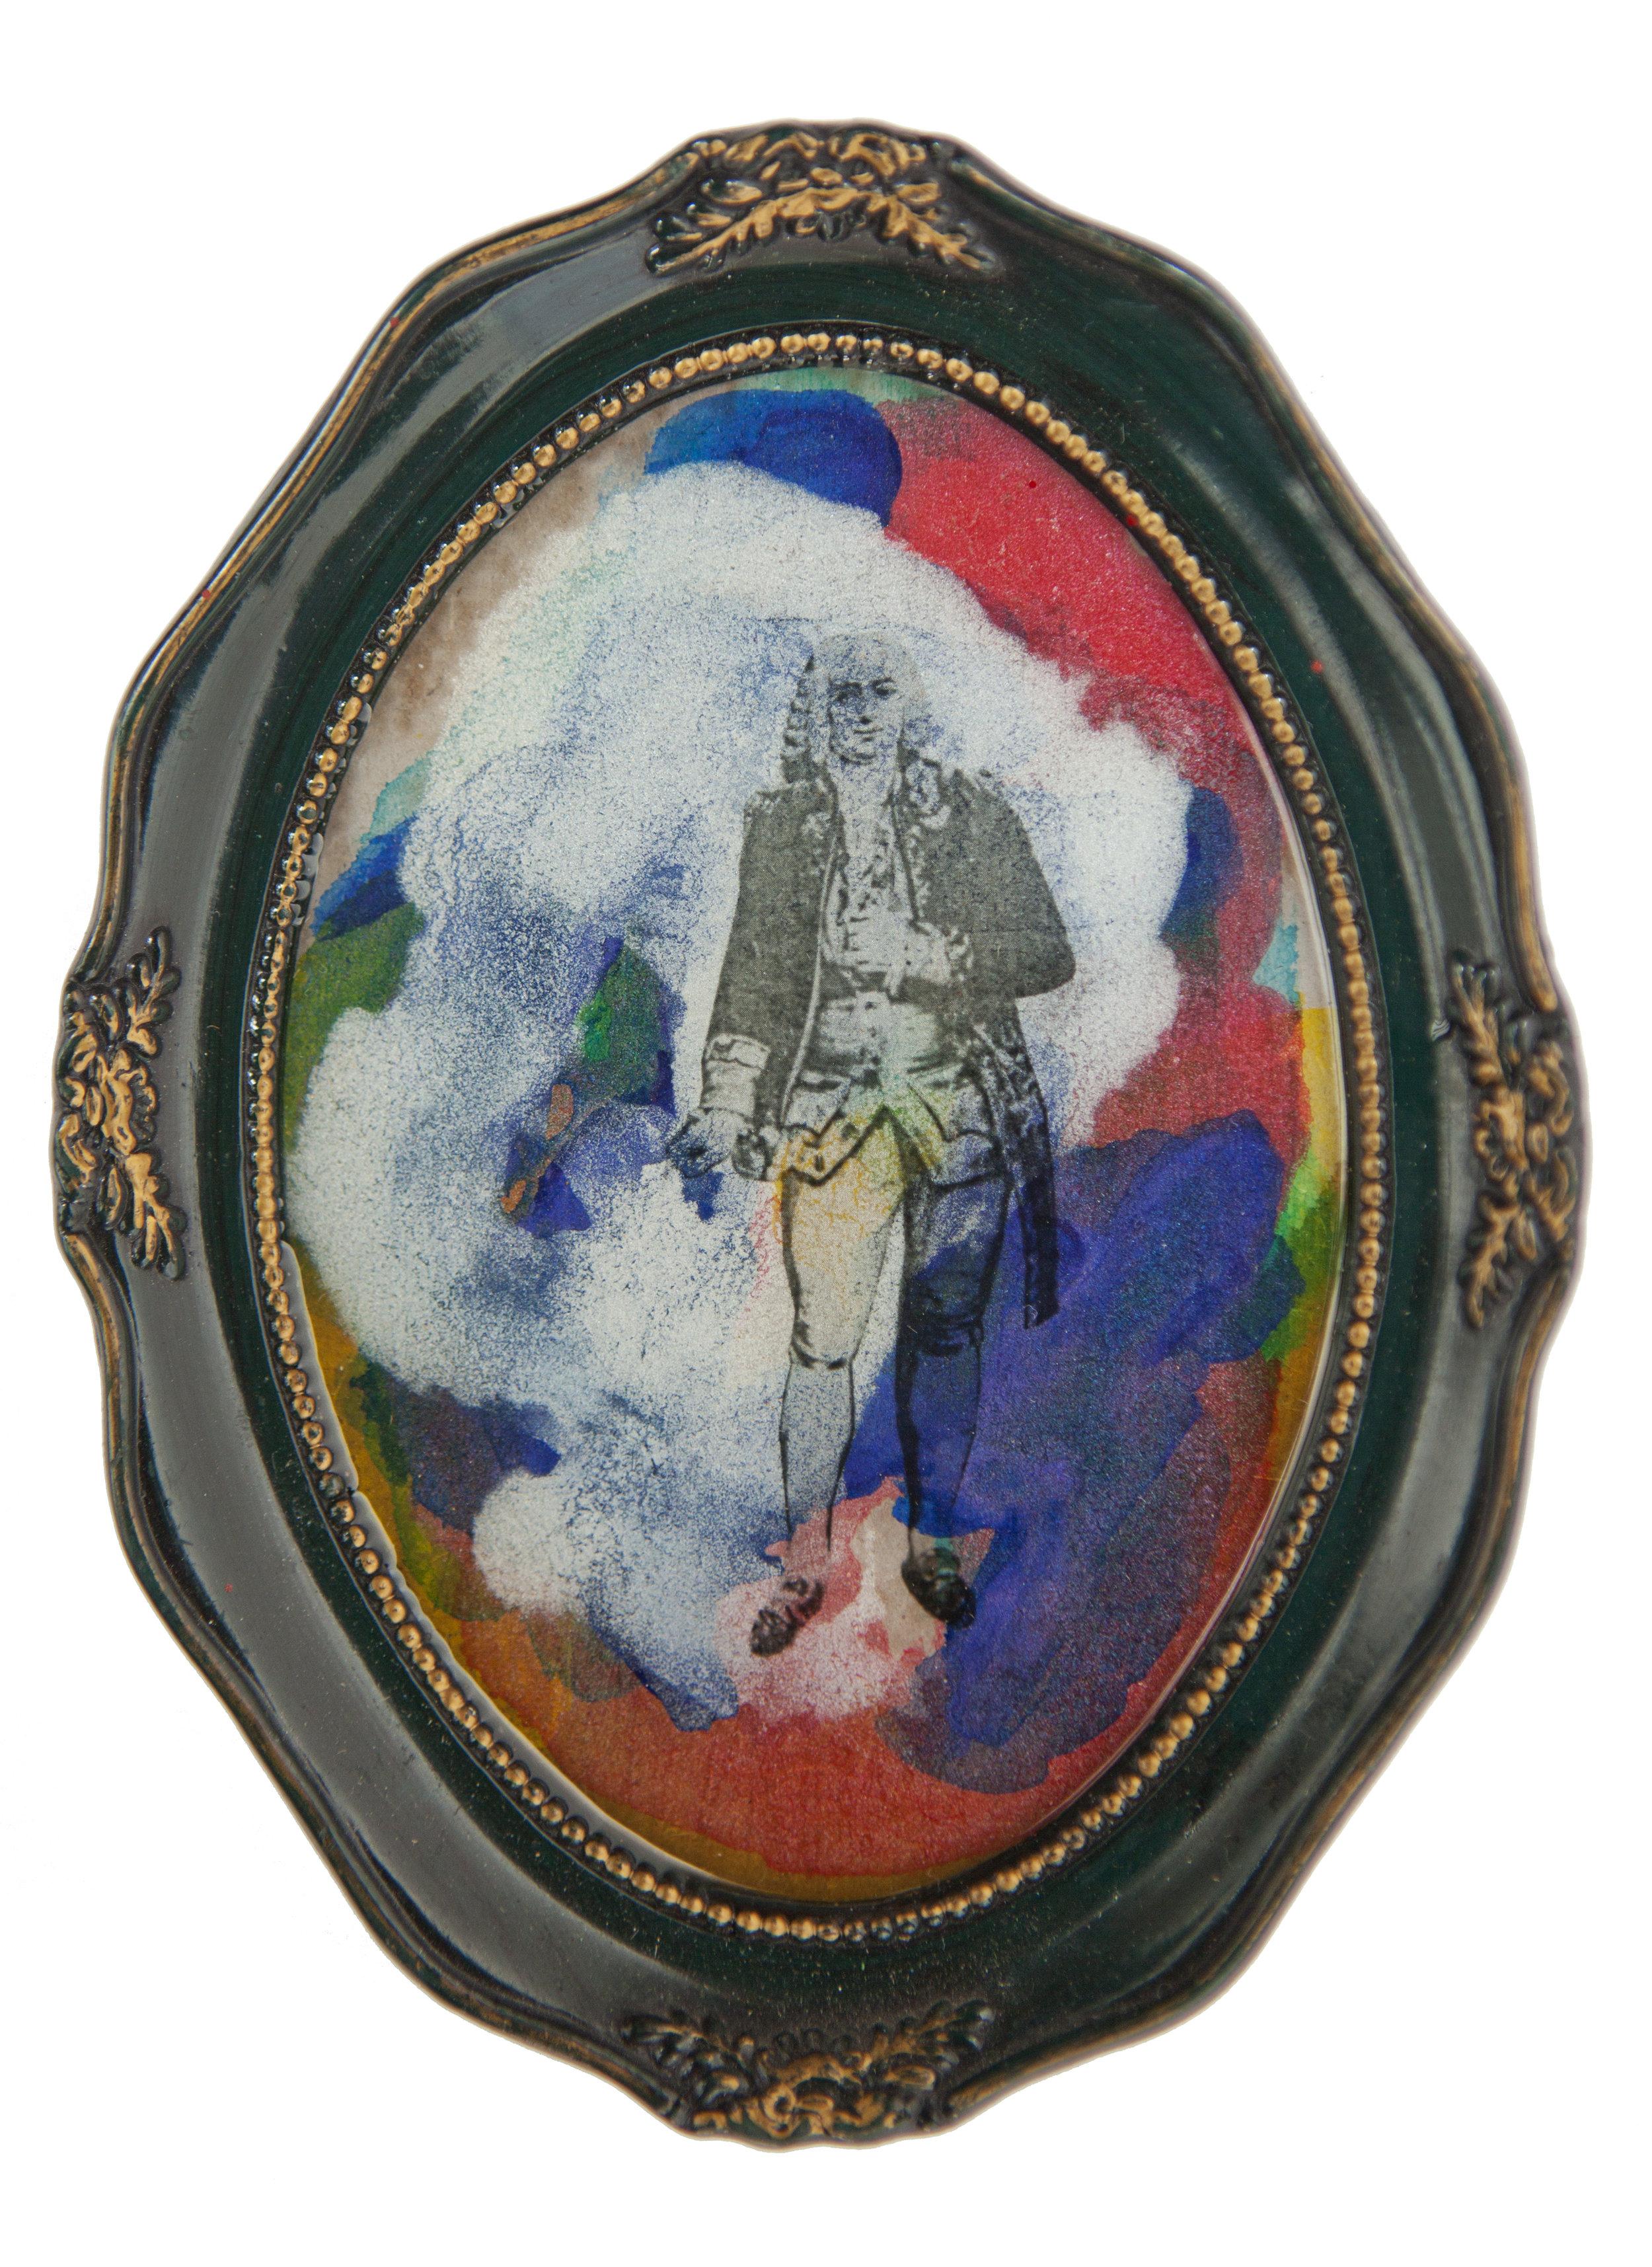 Shiraz Bayjoo    Governor part 2    Acrylic on board, resin, wood  15 x 11.5 x 1.5 cm  2016